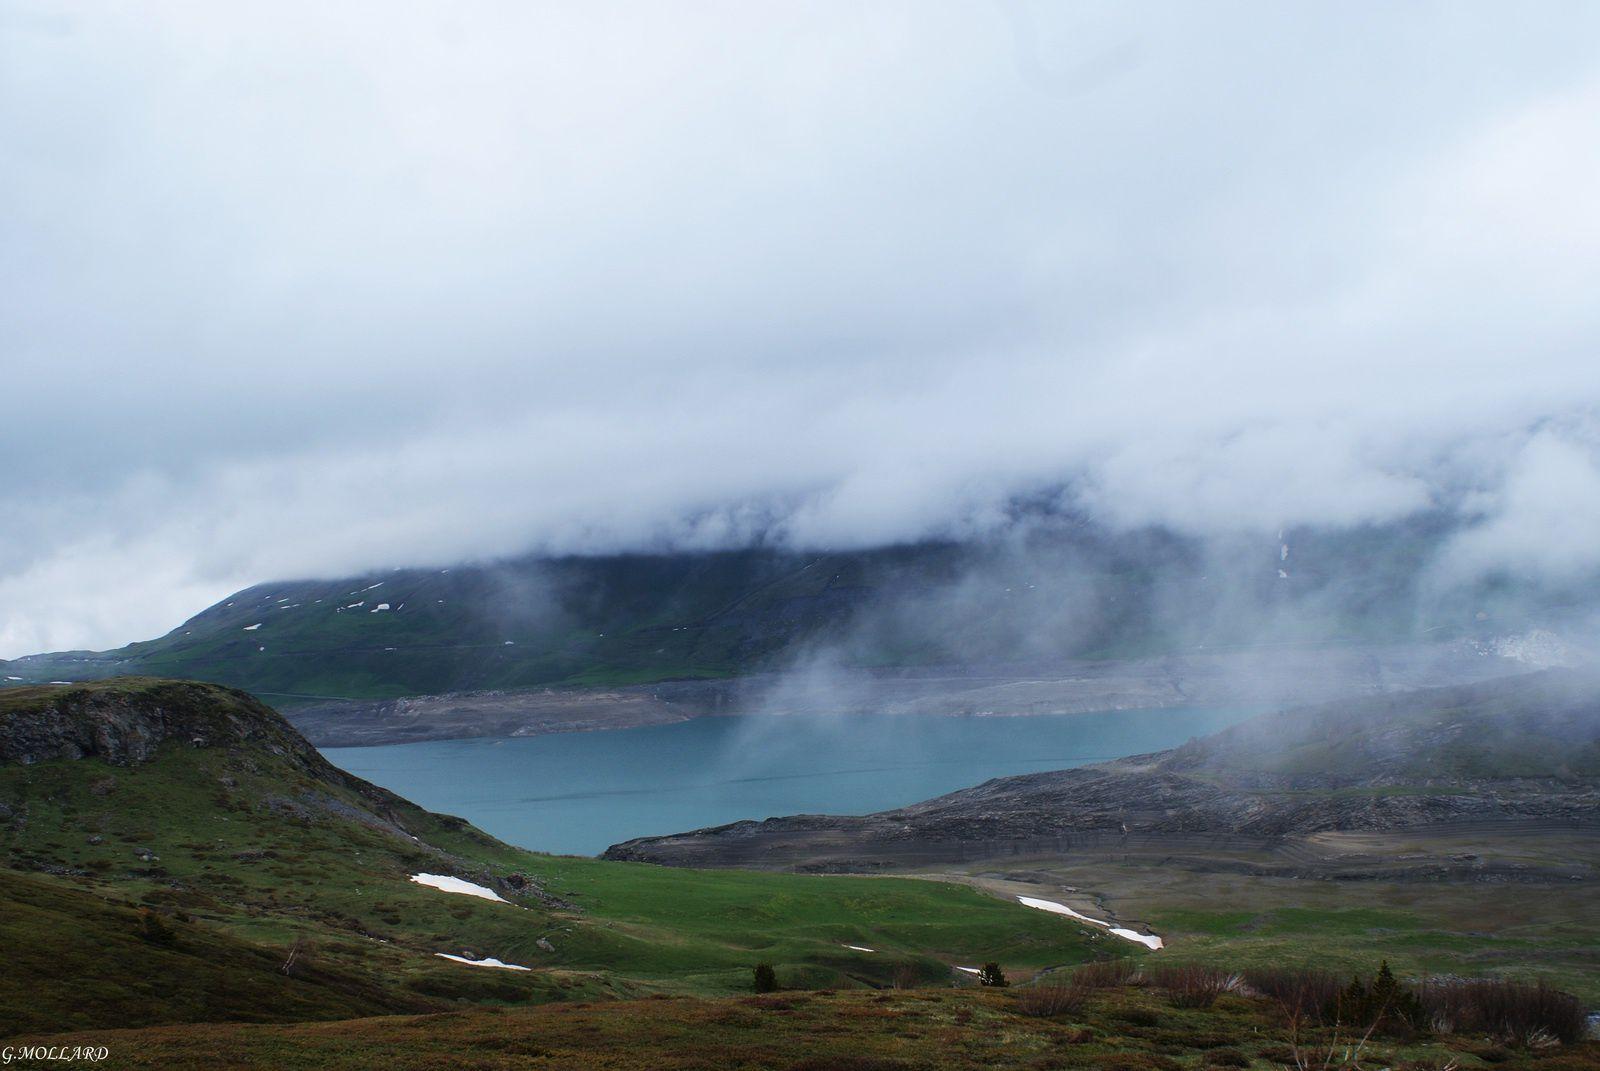 le brouillard gagne le lac.